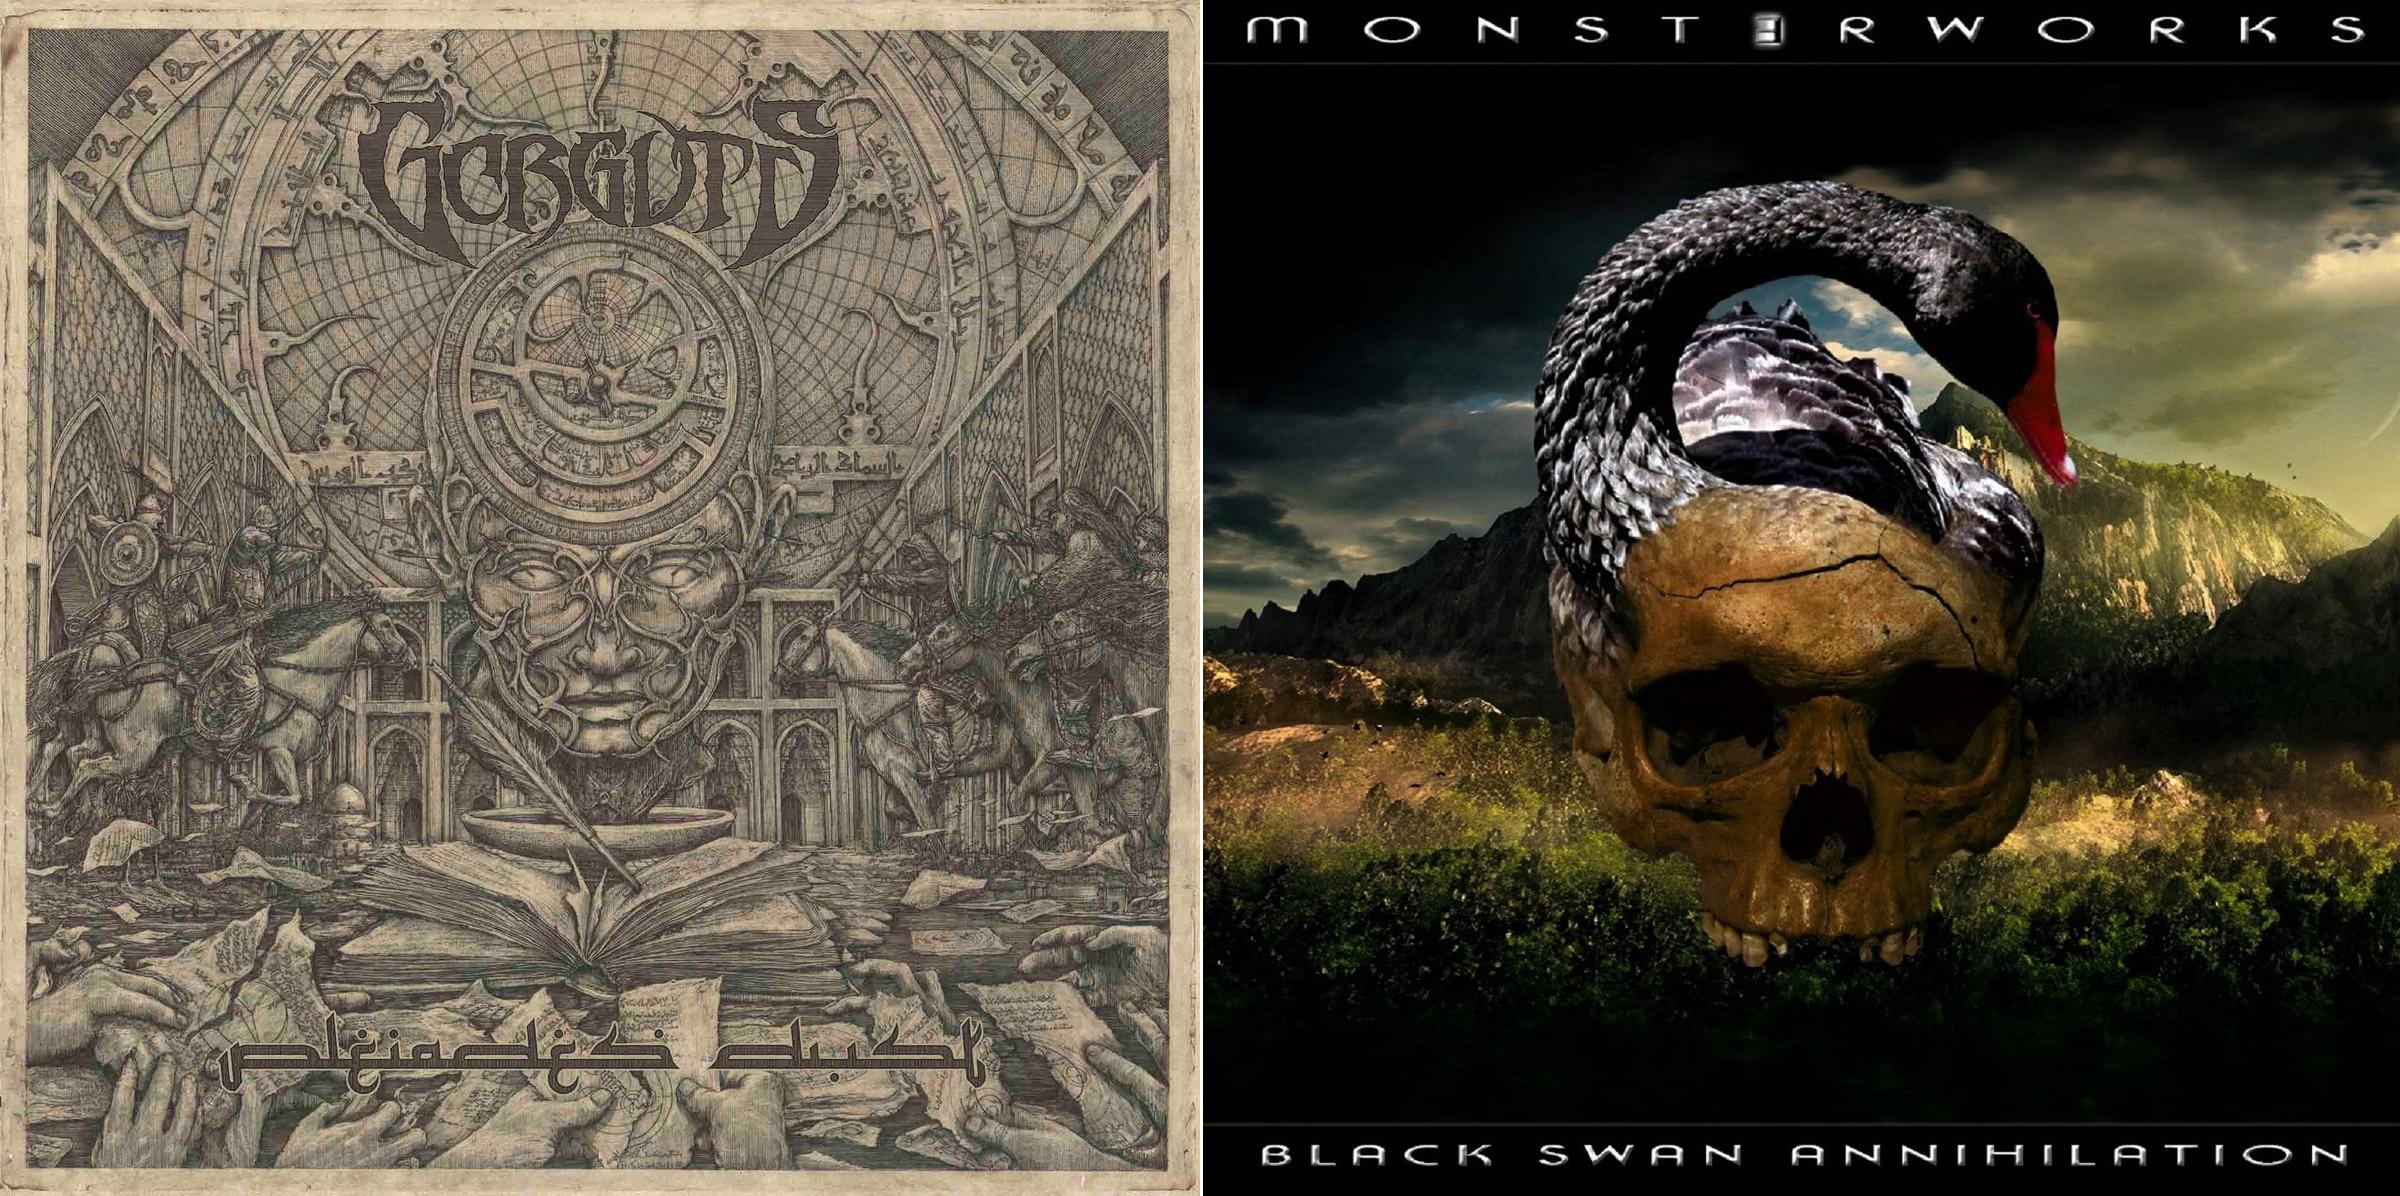 Gorguts / Monsterworks